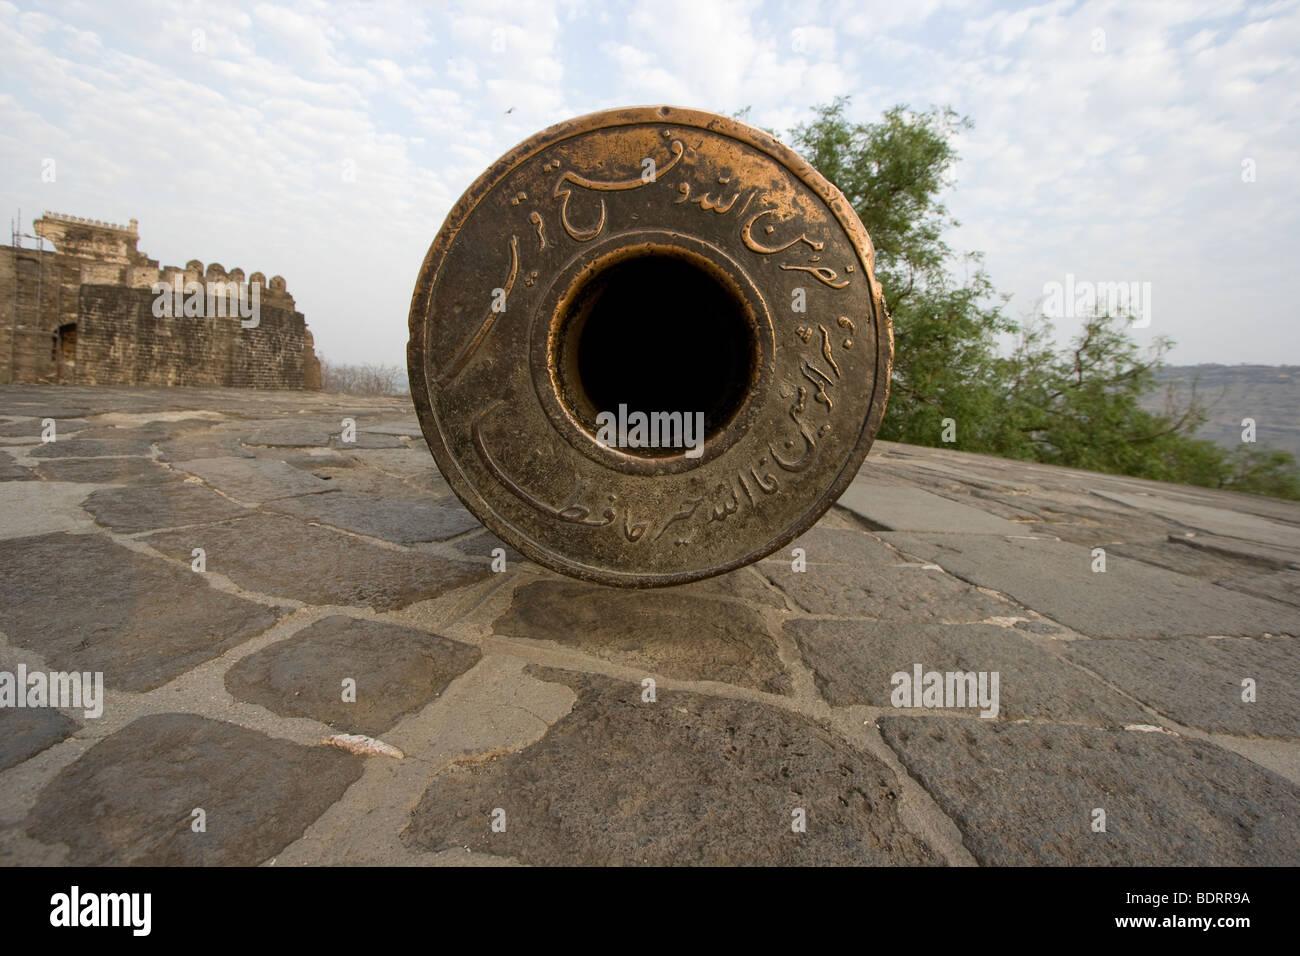 Cannon detail in Devagiri Fort in Daulatabad near Aurangabad India - Stock Image